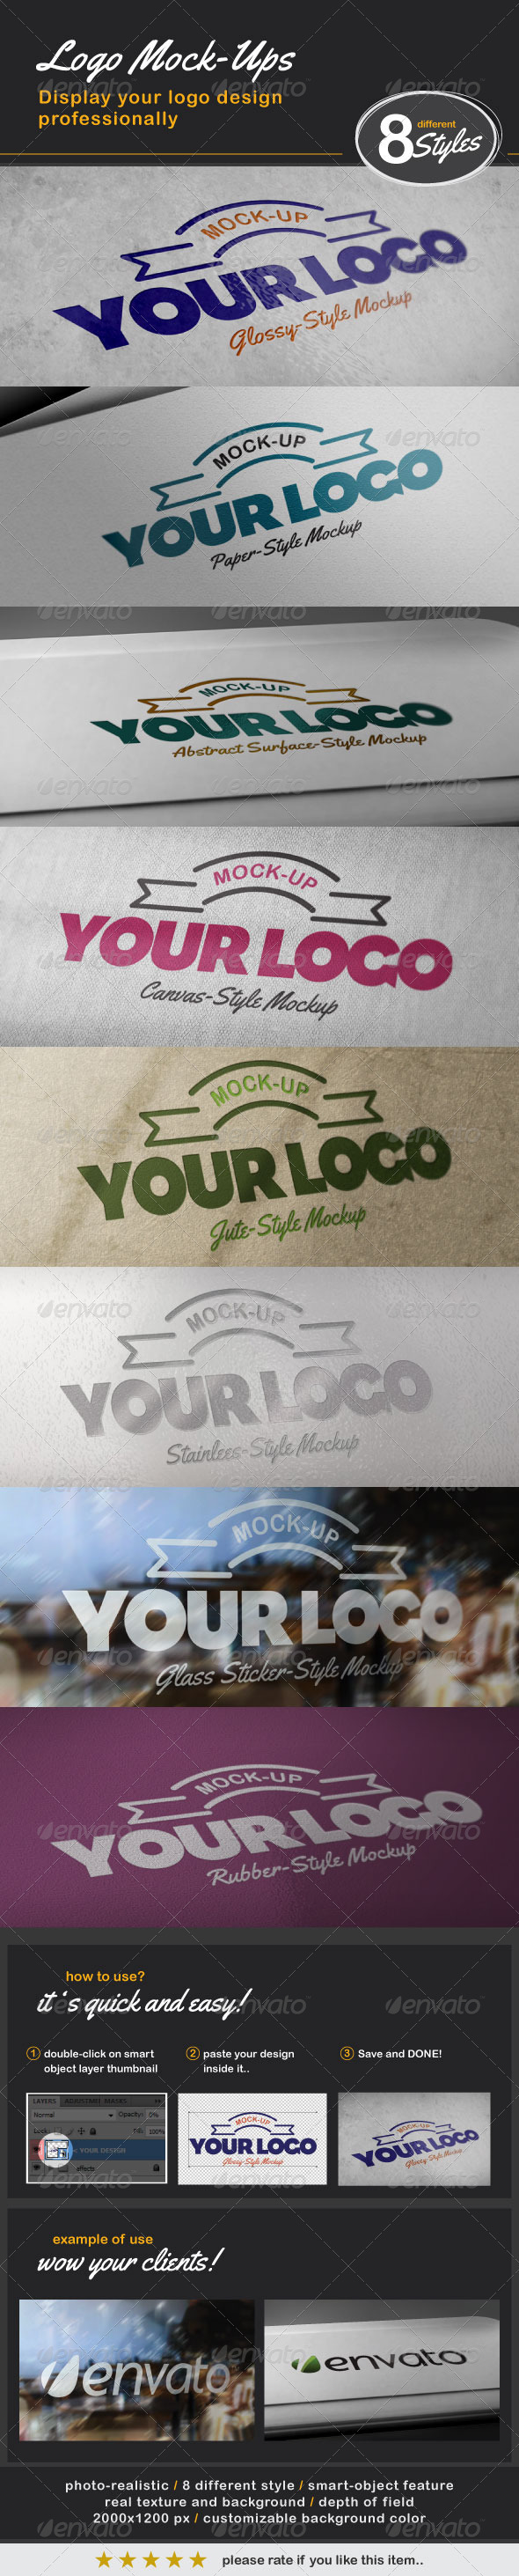 8 Photo-Realistic Logo Mock-ups - Logo Product Mock-Ups